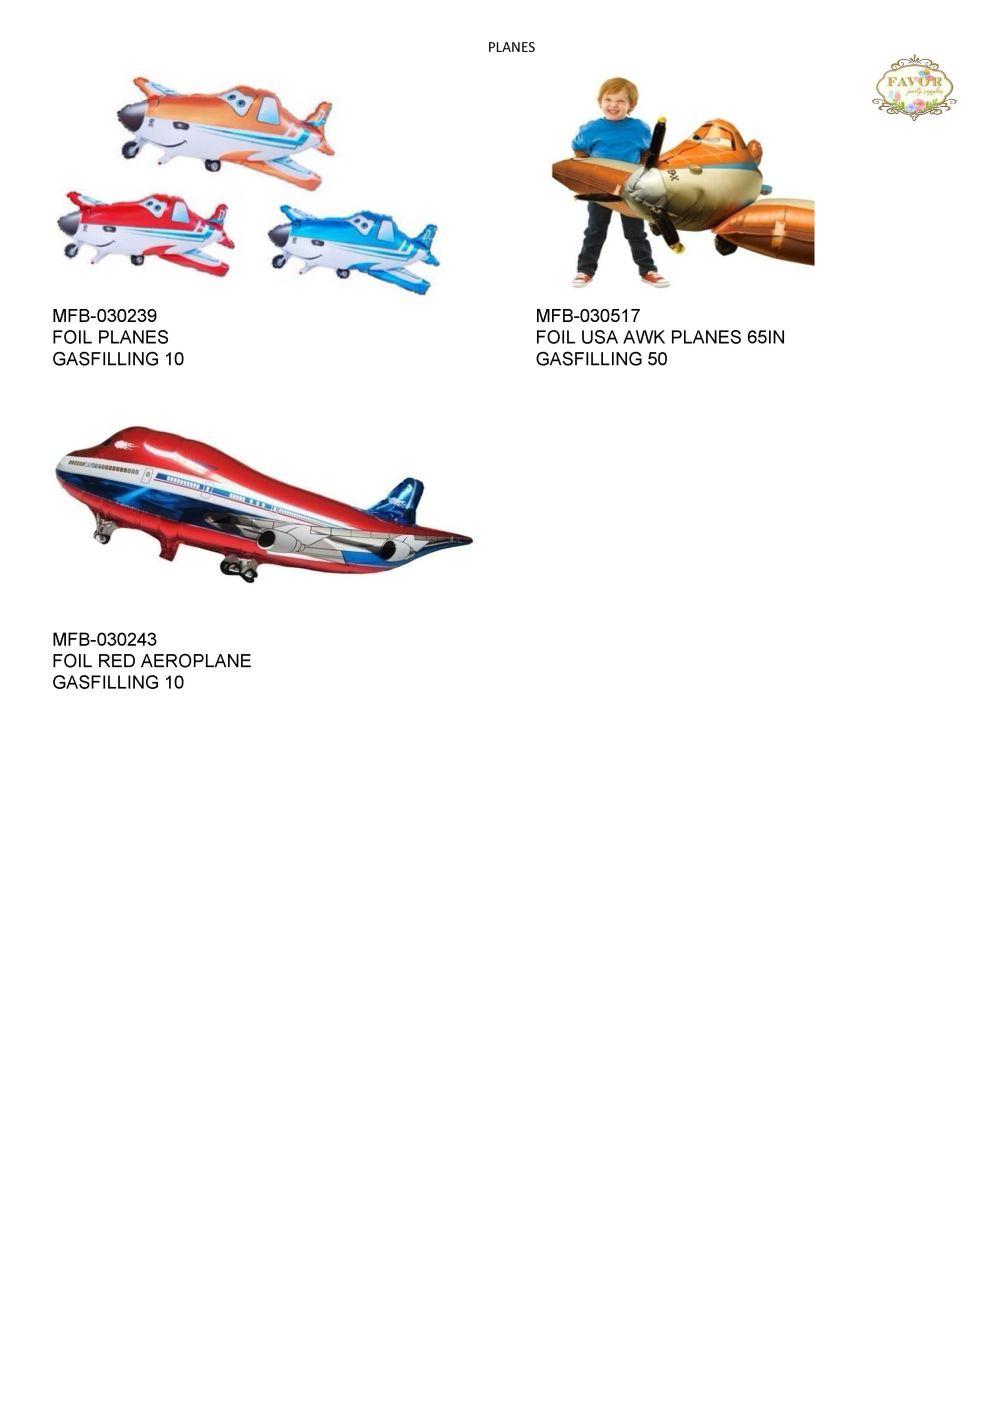 katalog-planes